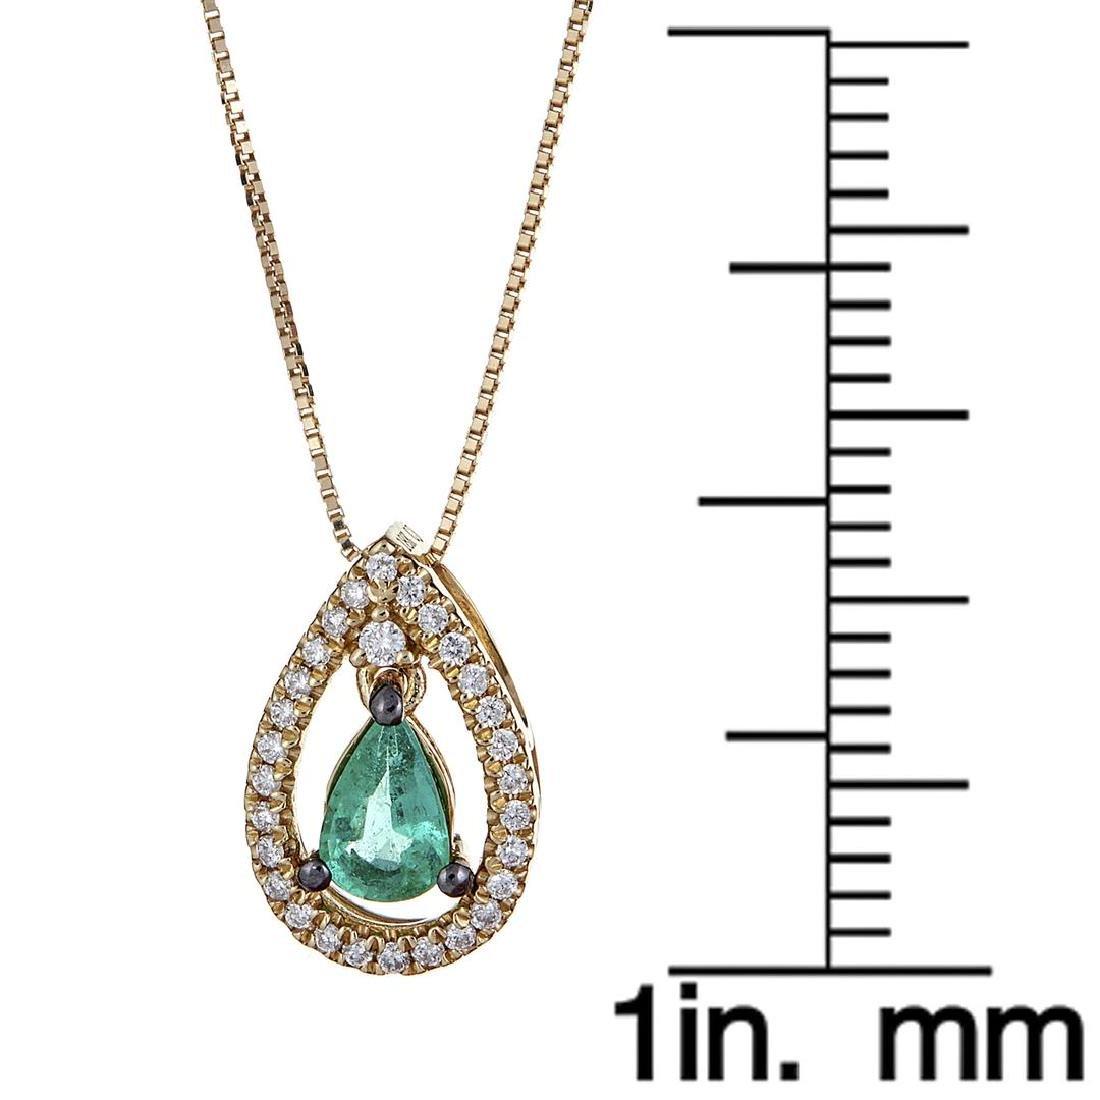 0.34 ctw Emerald and Diamond Pendant - 18KT Yellow Gold